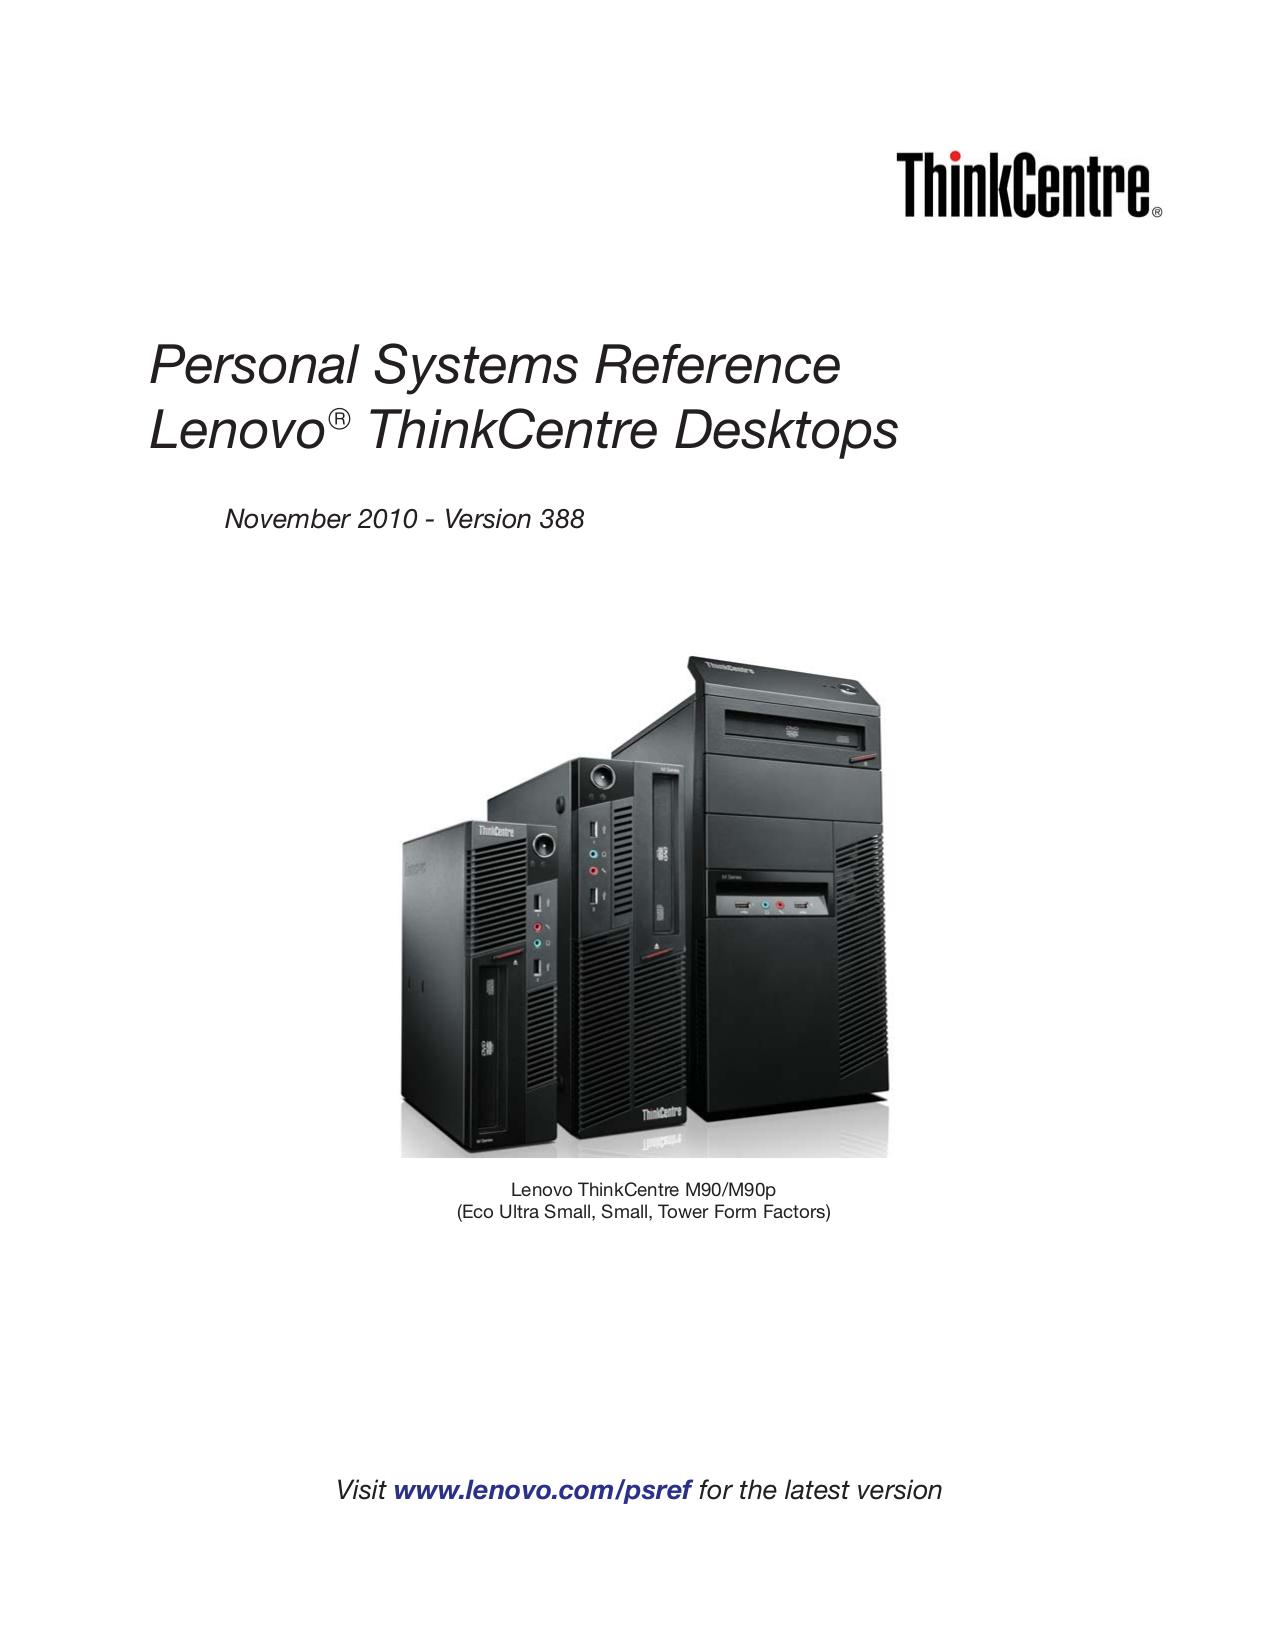 pdf for Lenovo Desktop ThinkCentre M58e 7843 manual